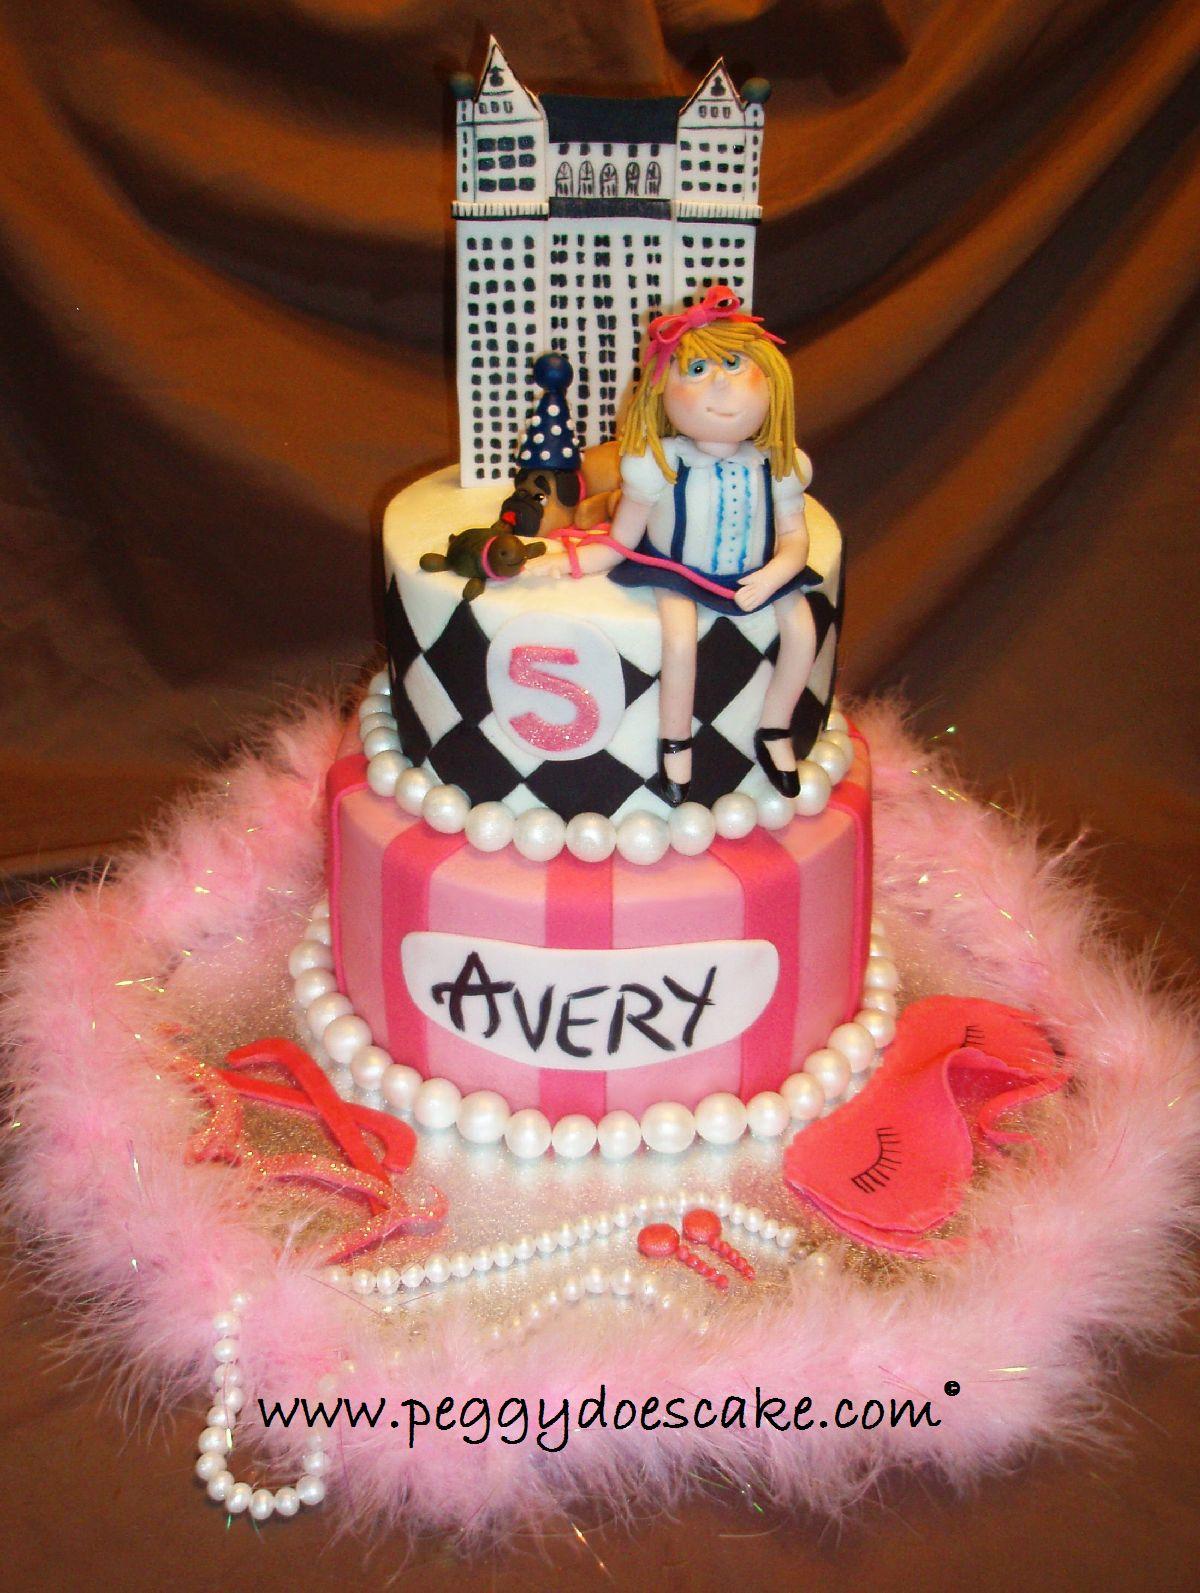 February Birthday Cakes Peggy Does Cake Eloise In The Plaza Birthday Cake Click Photos